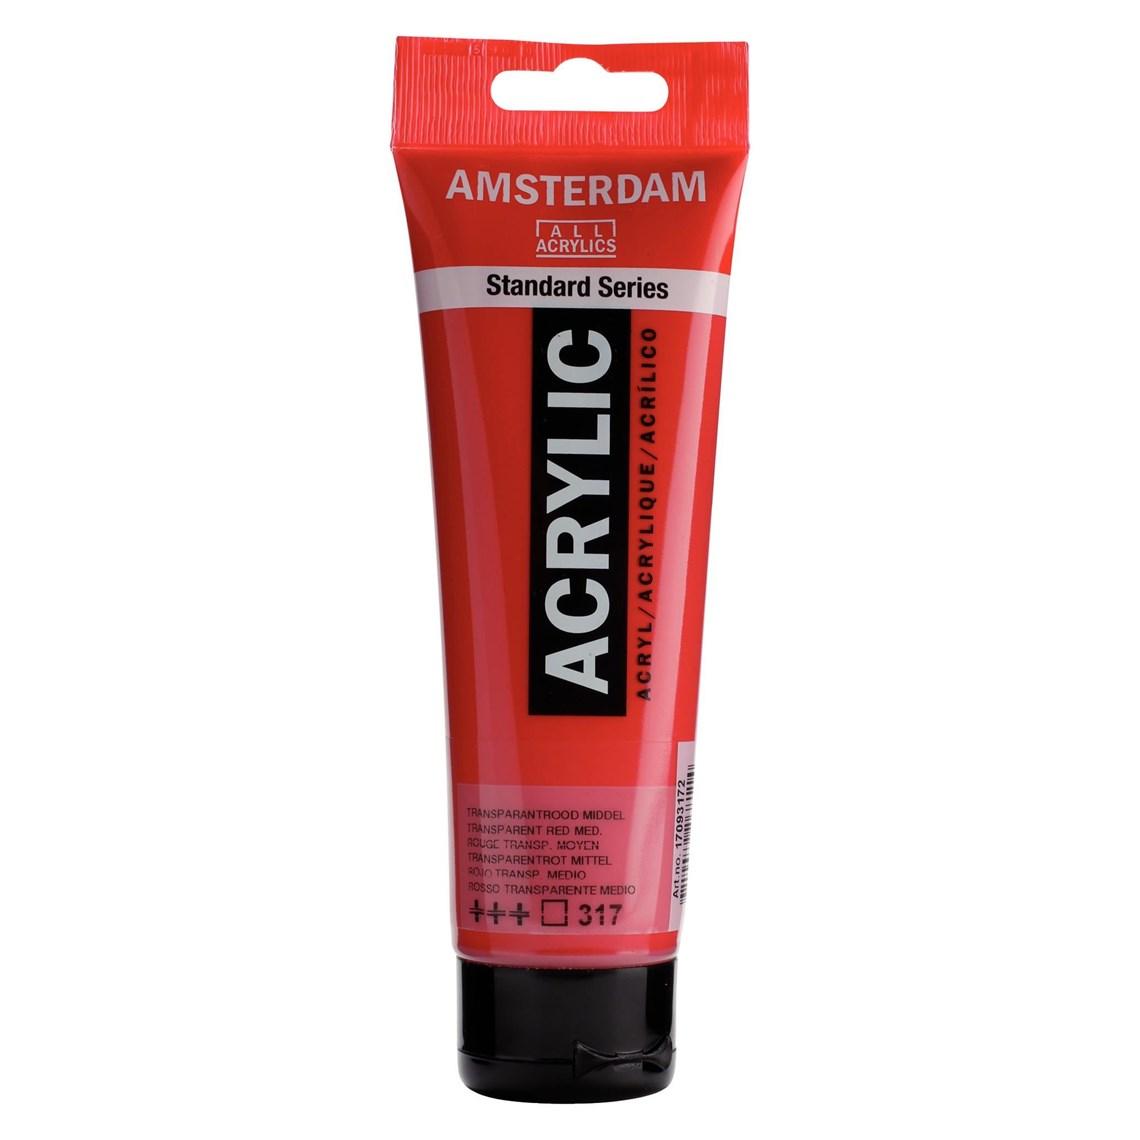 Amsterdam acrylverf Transparantrood middel 317